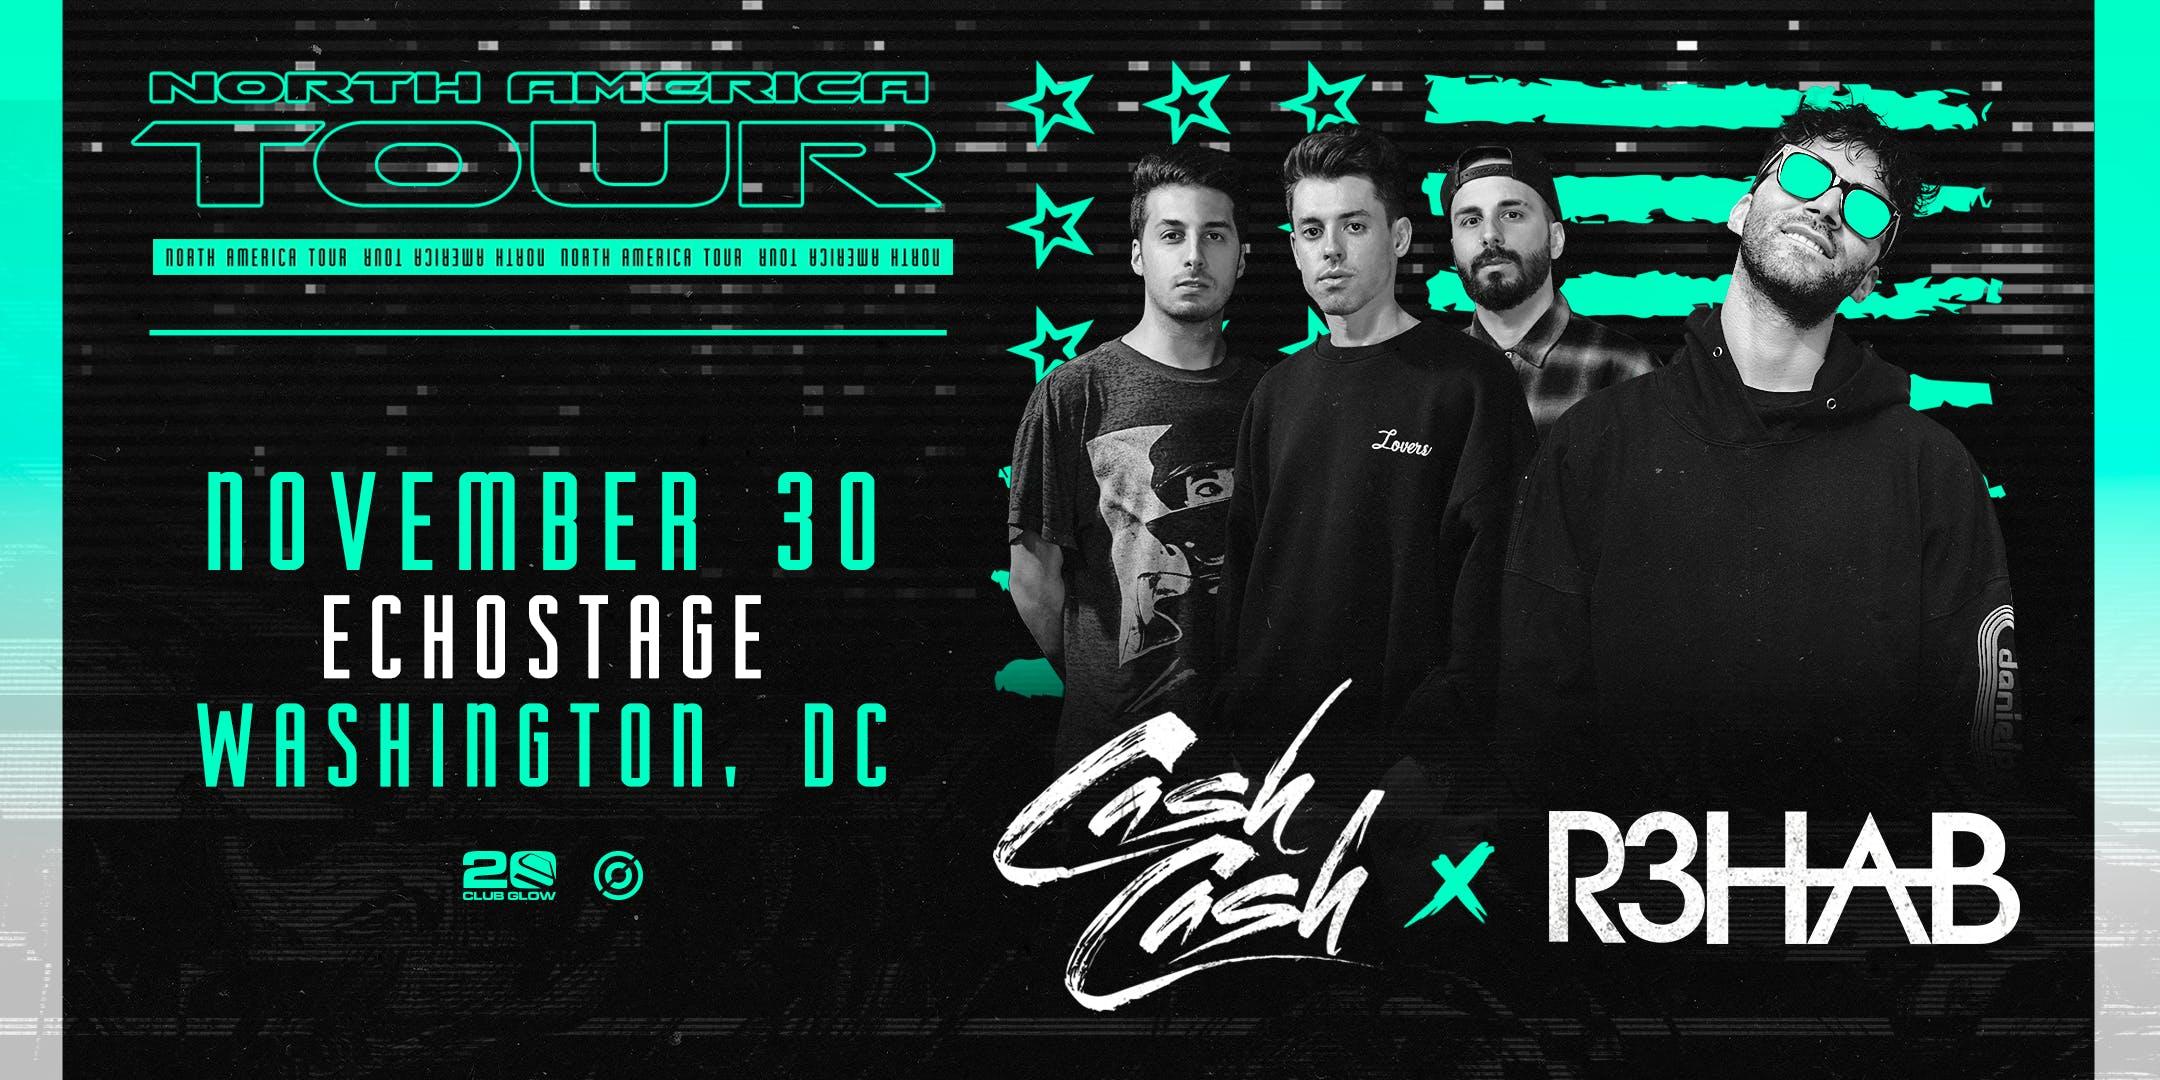 Echostage | Washington, DC Concert Venue